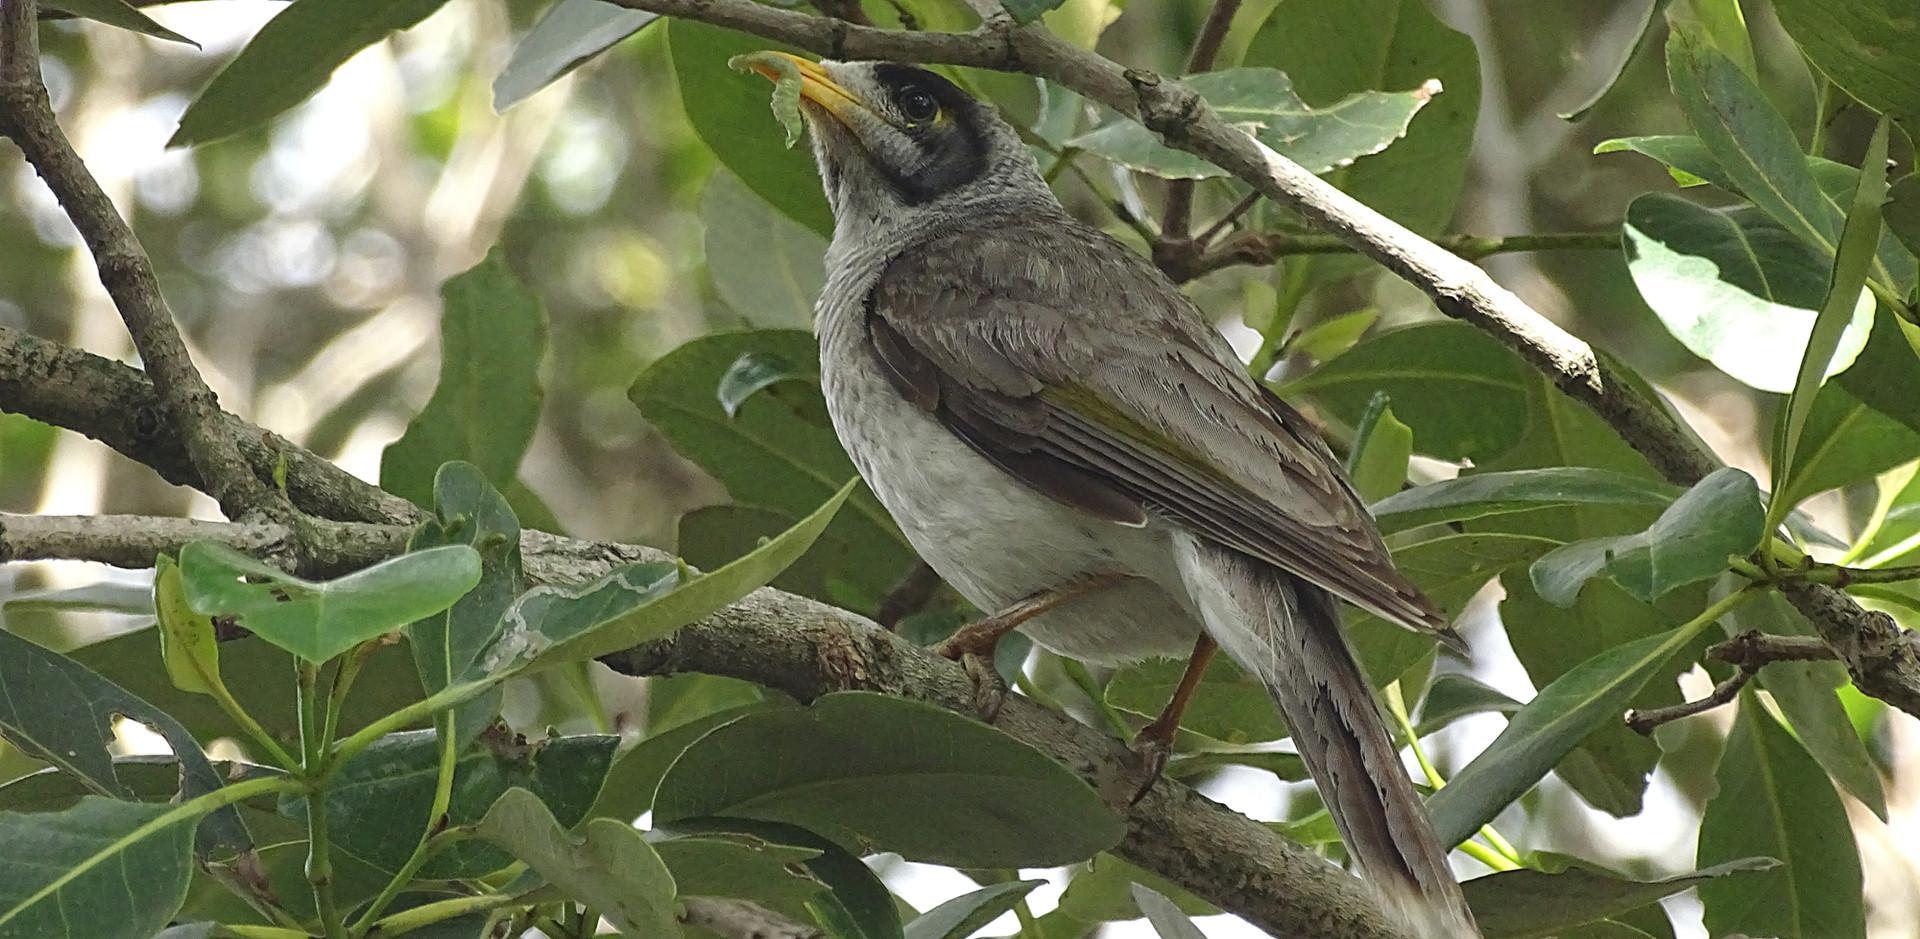 Adult Noisy Miner bringing a catepillar to nest